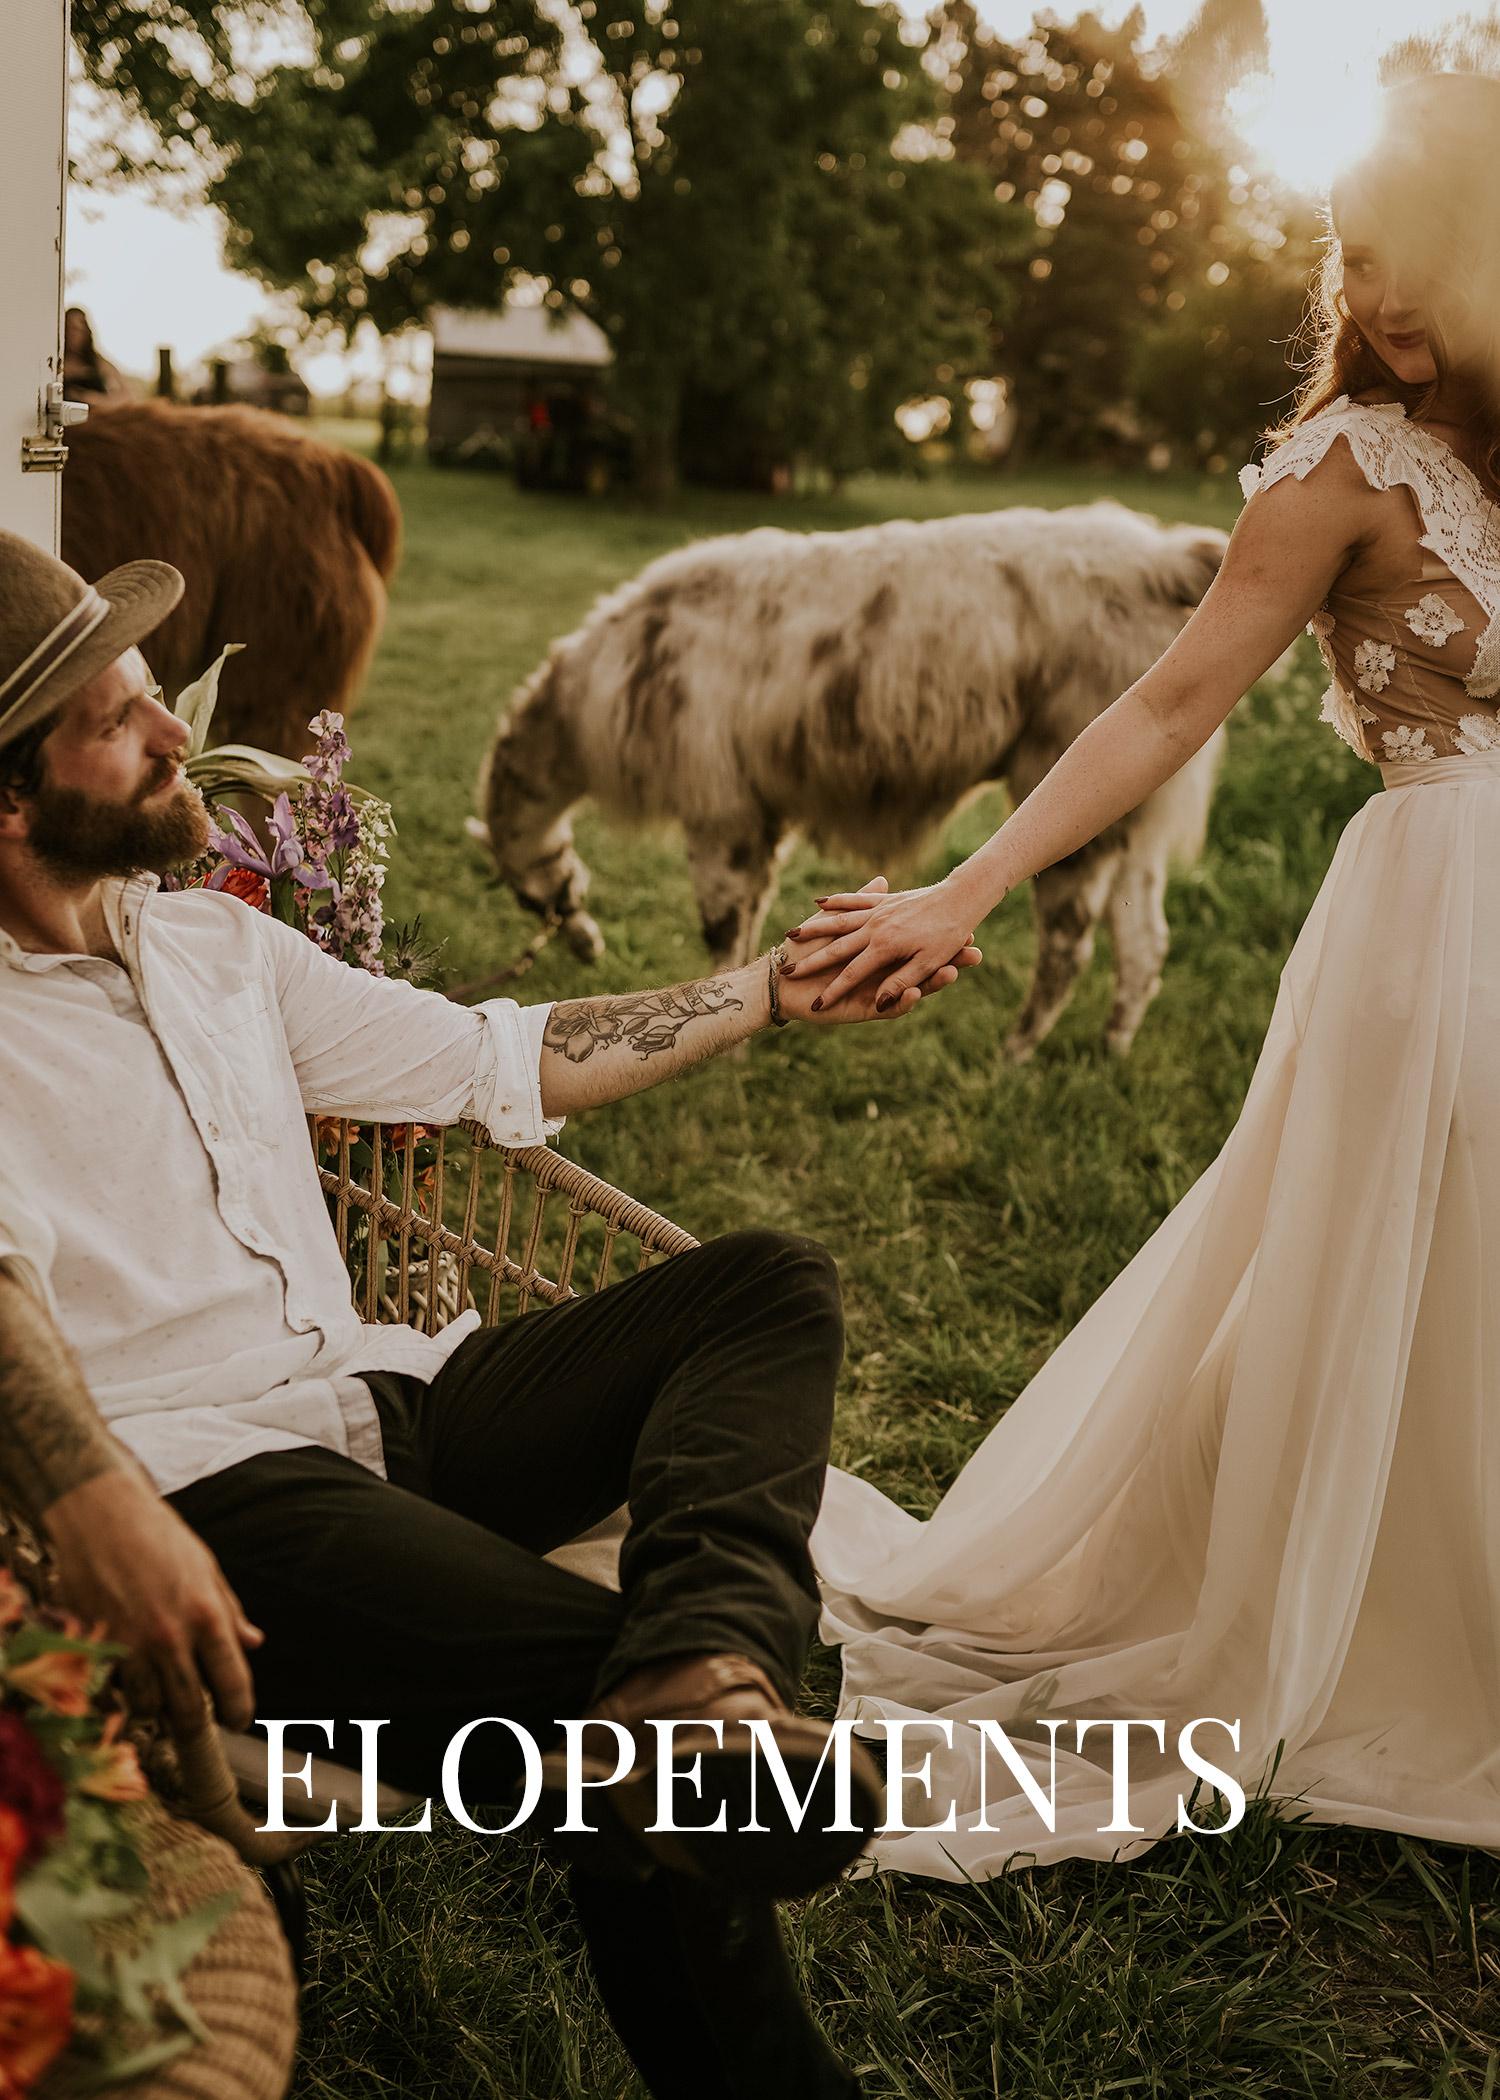 elopements-llama-country-wedding-raelyn-ramey-photography.jpg